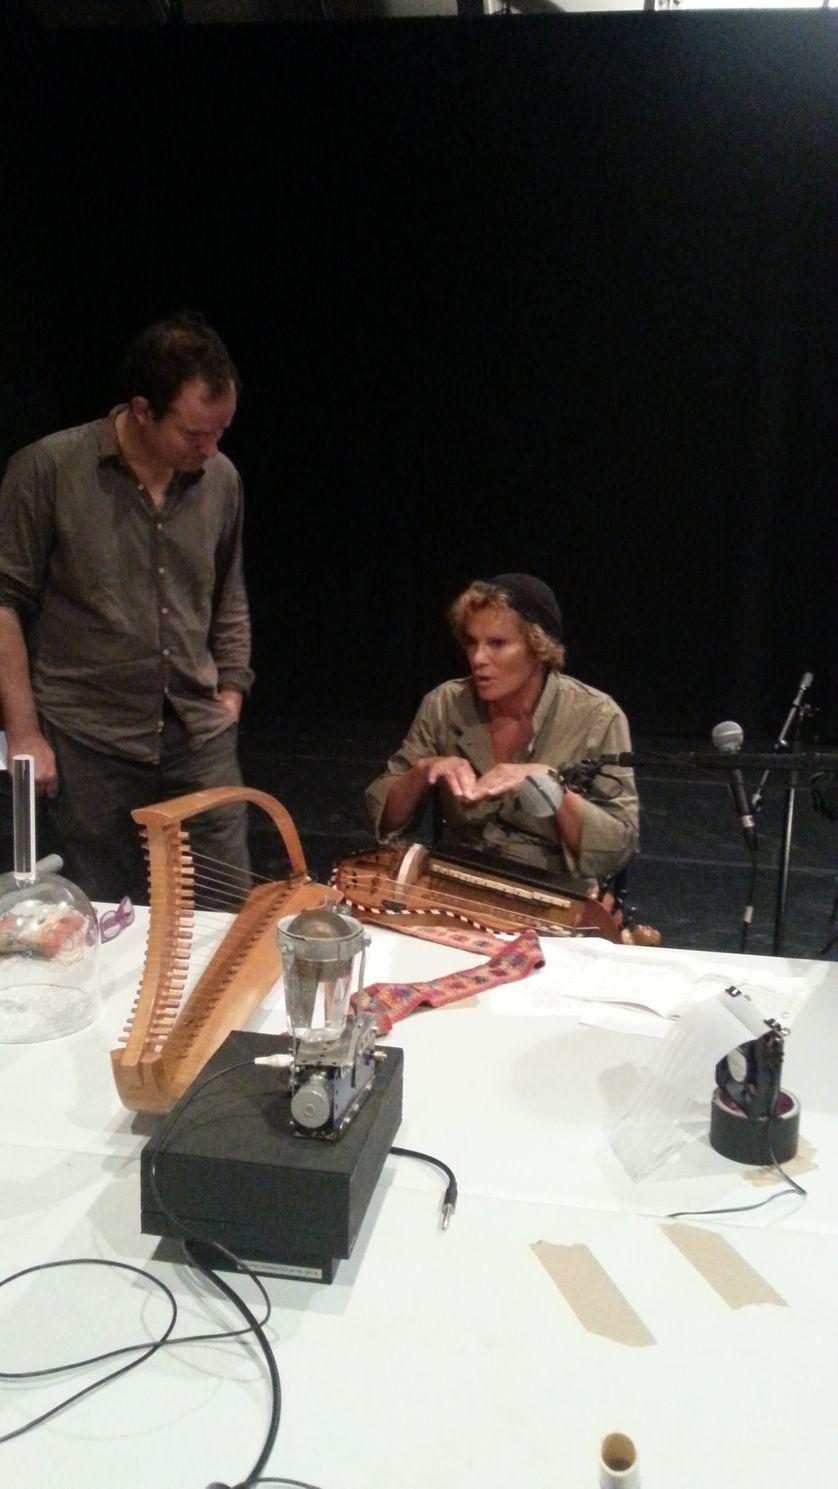 Thomas Baumgartner, Emmanuelle Parrenin avec instruments